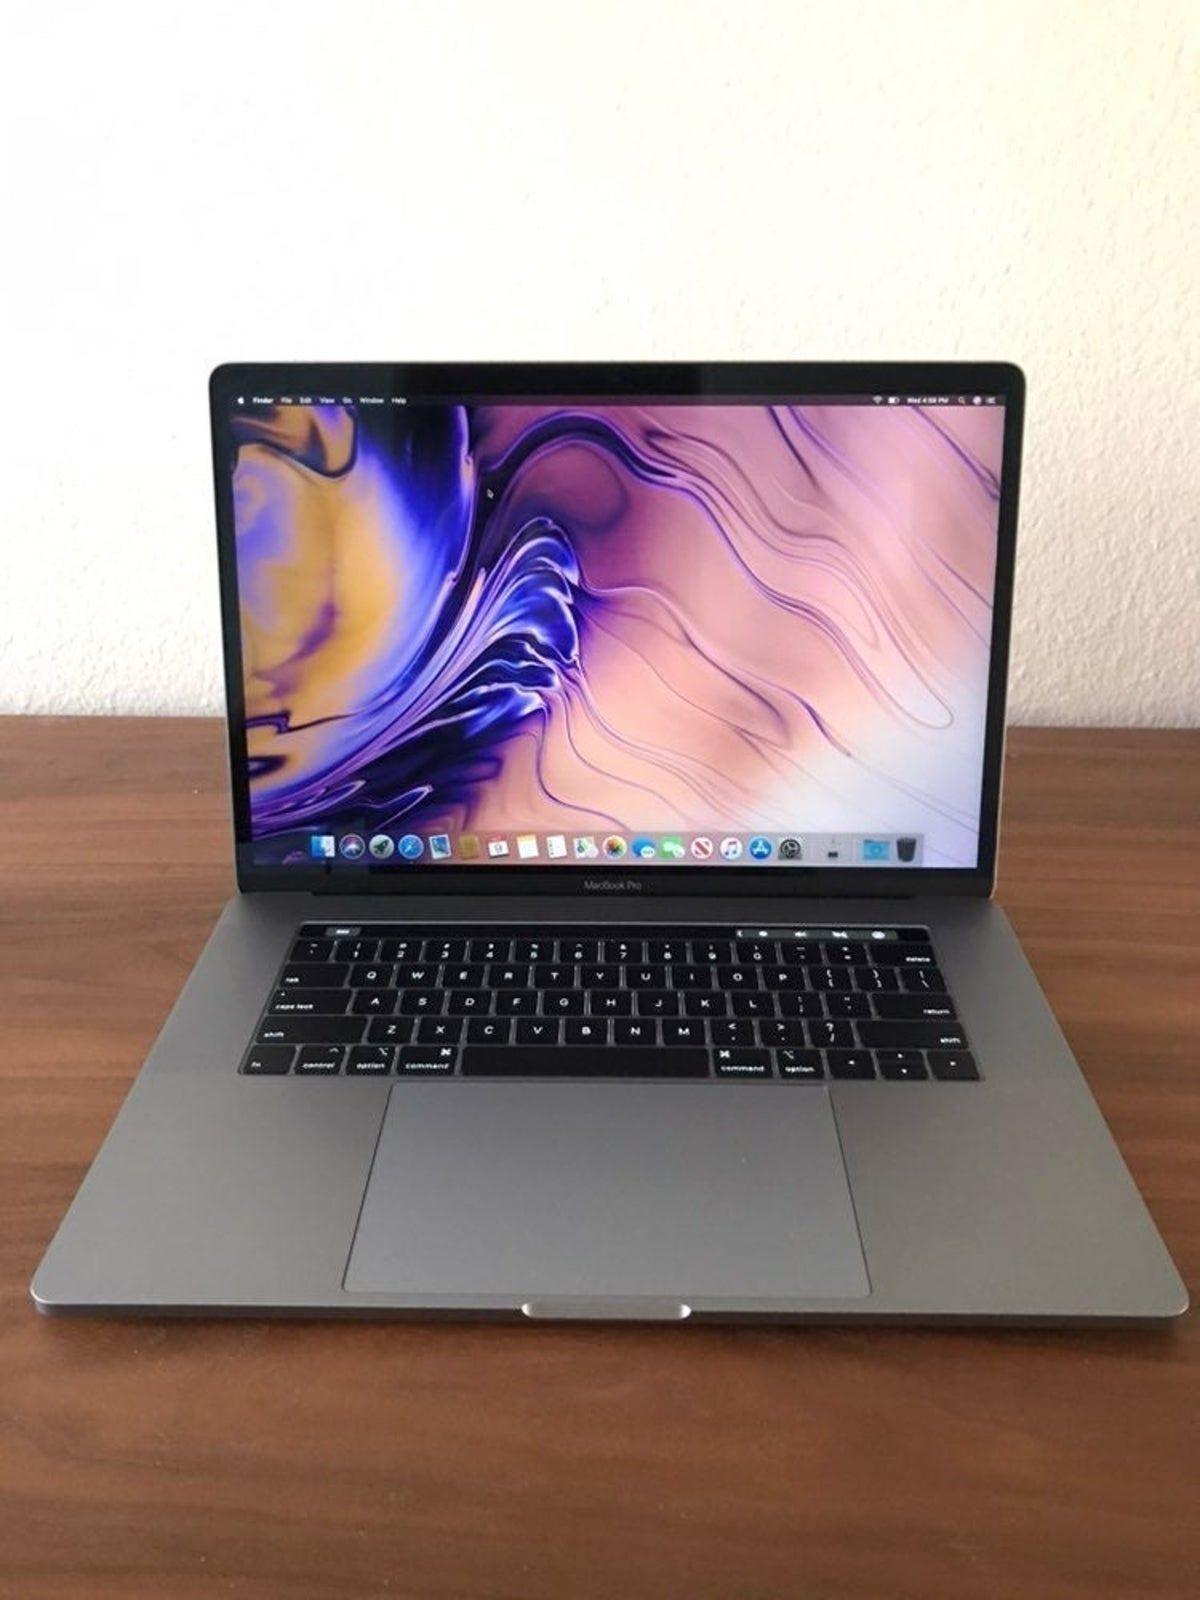 MacBook Pro 15 inch Touchbar - 2019 on Mercari